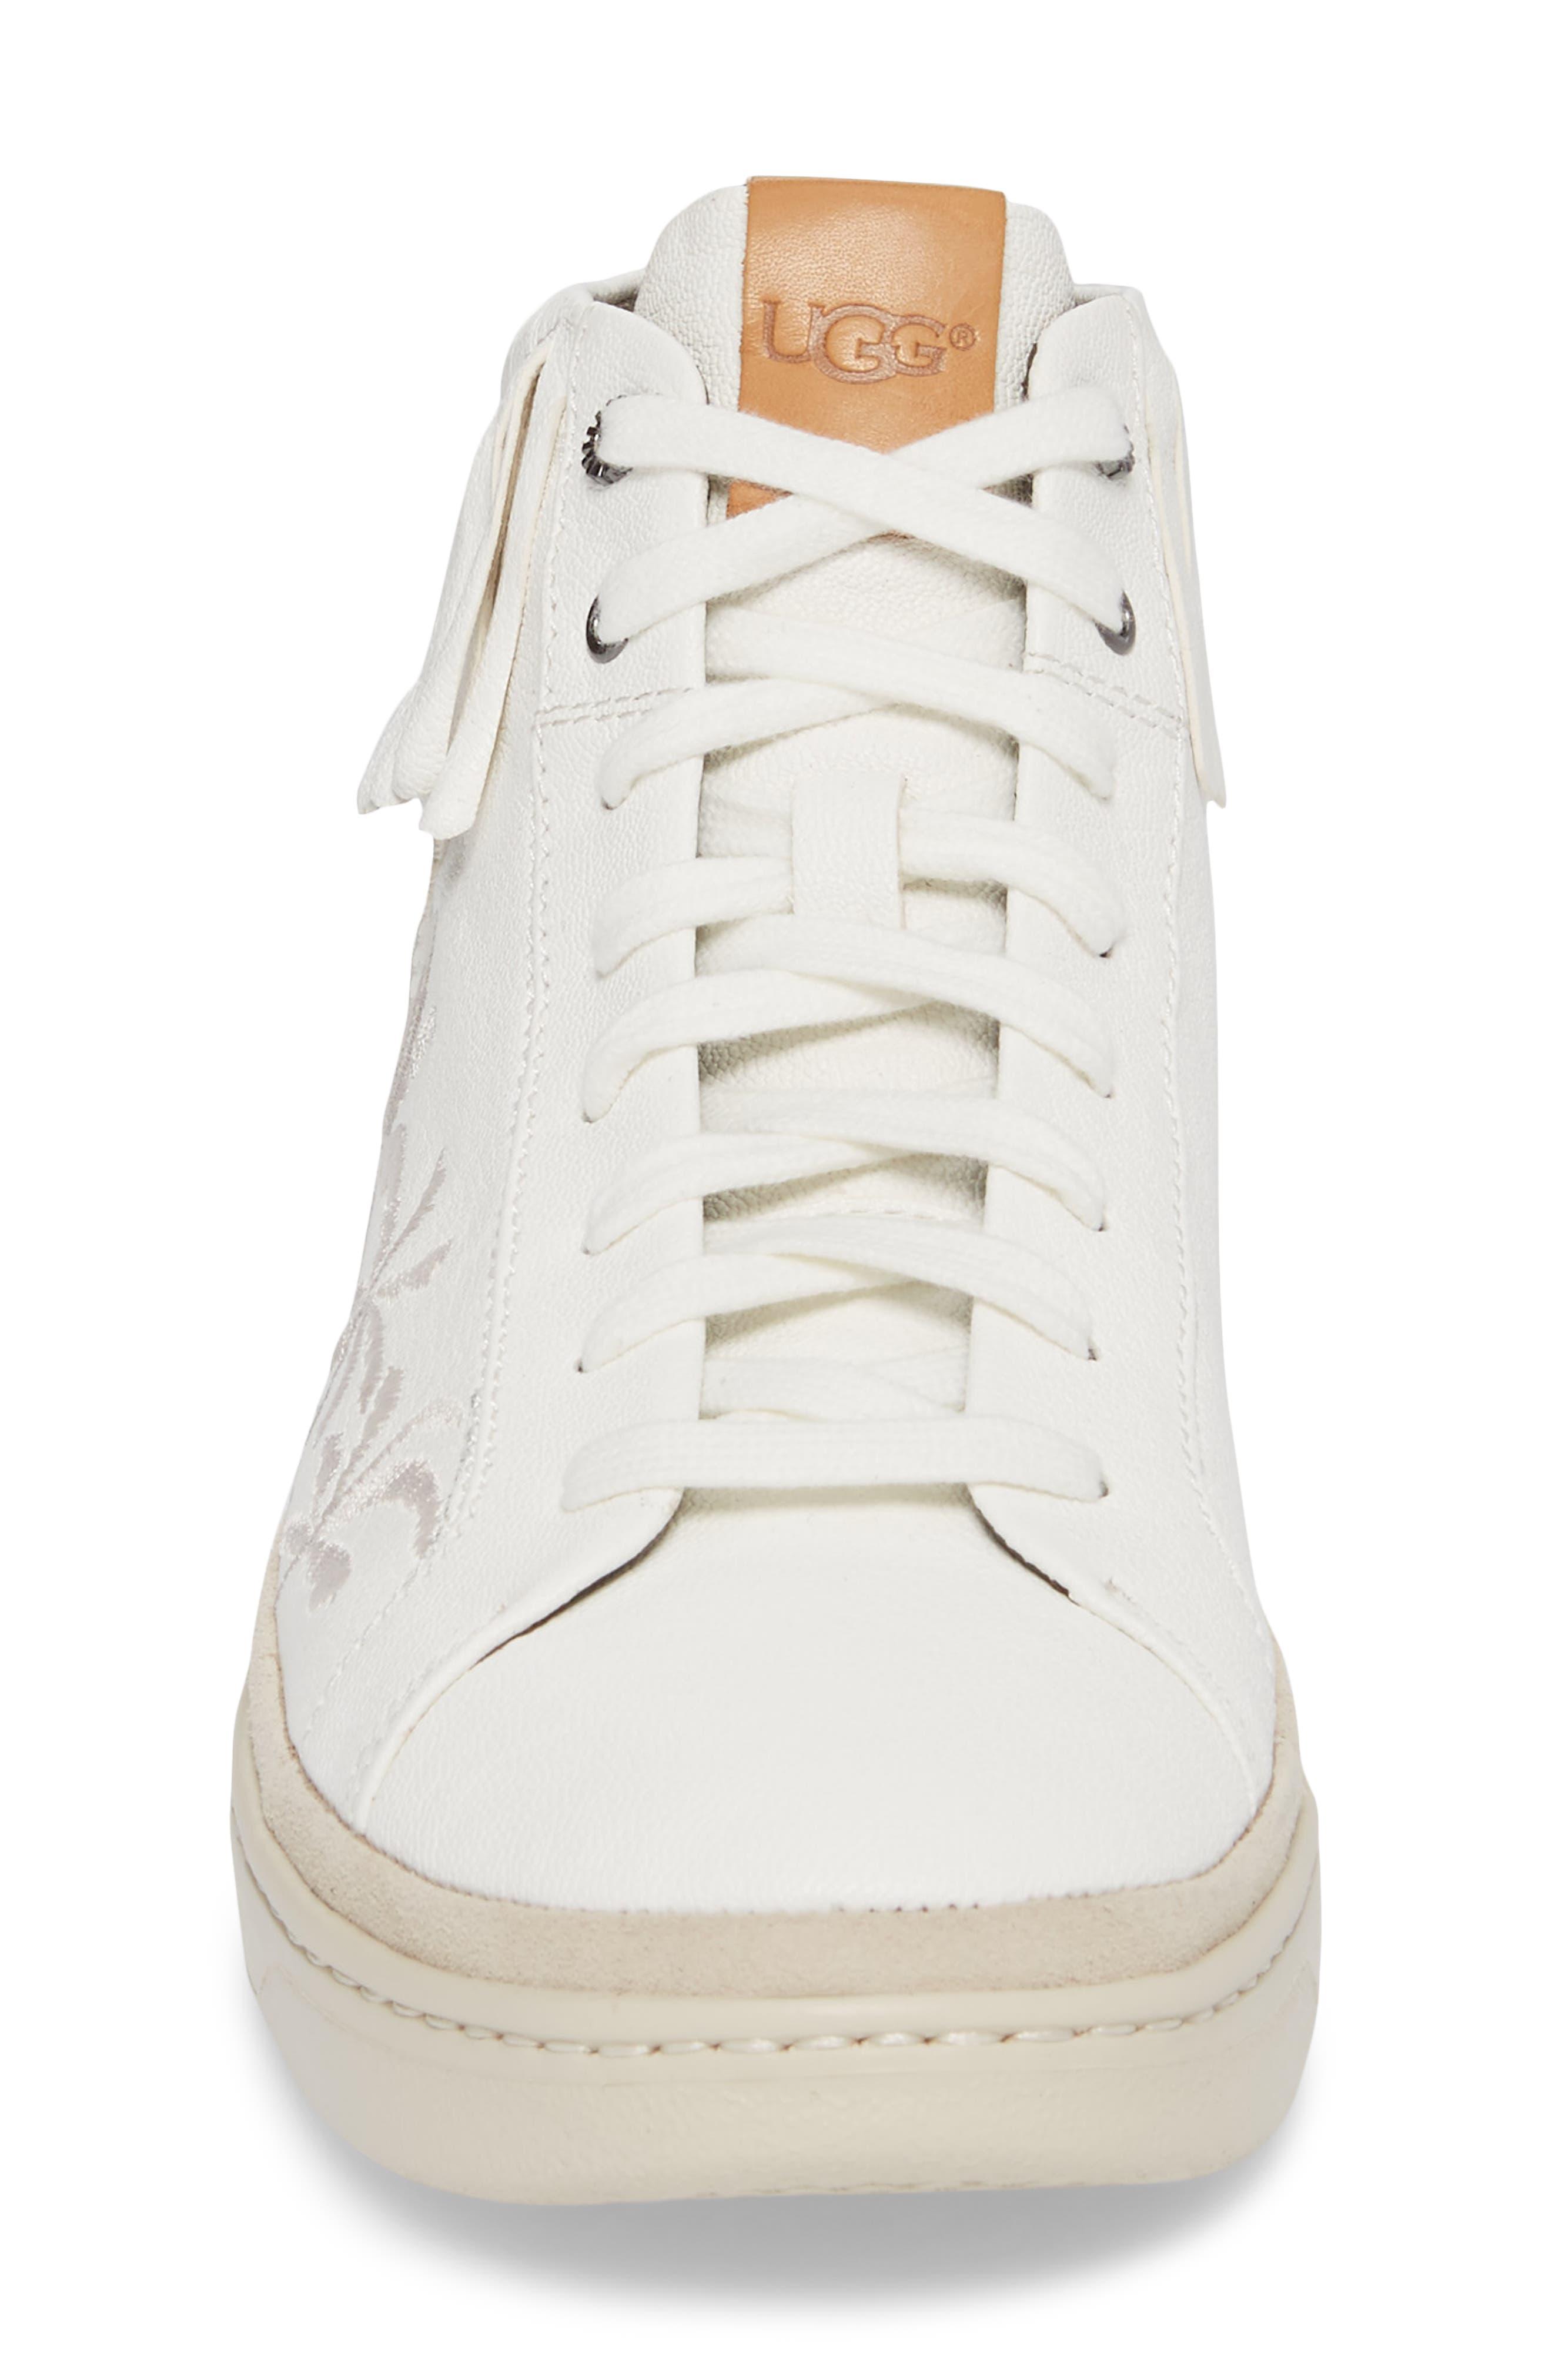 Cali Fringe High Top Sneaker,                             Alternate thumbnail 4, color,                             100